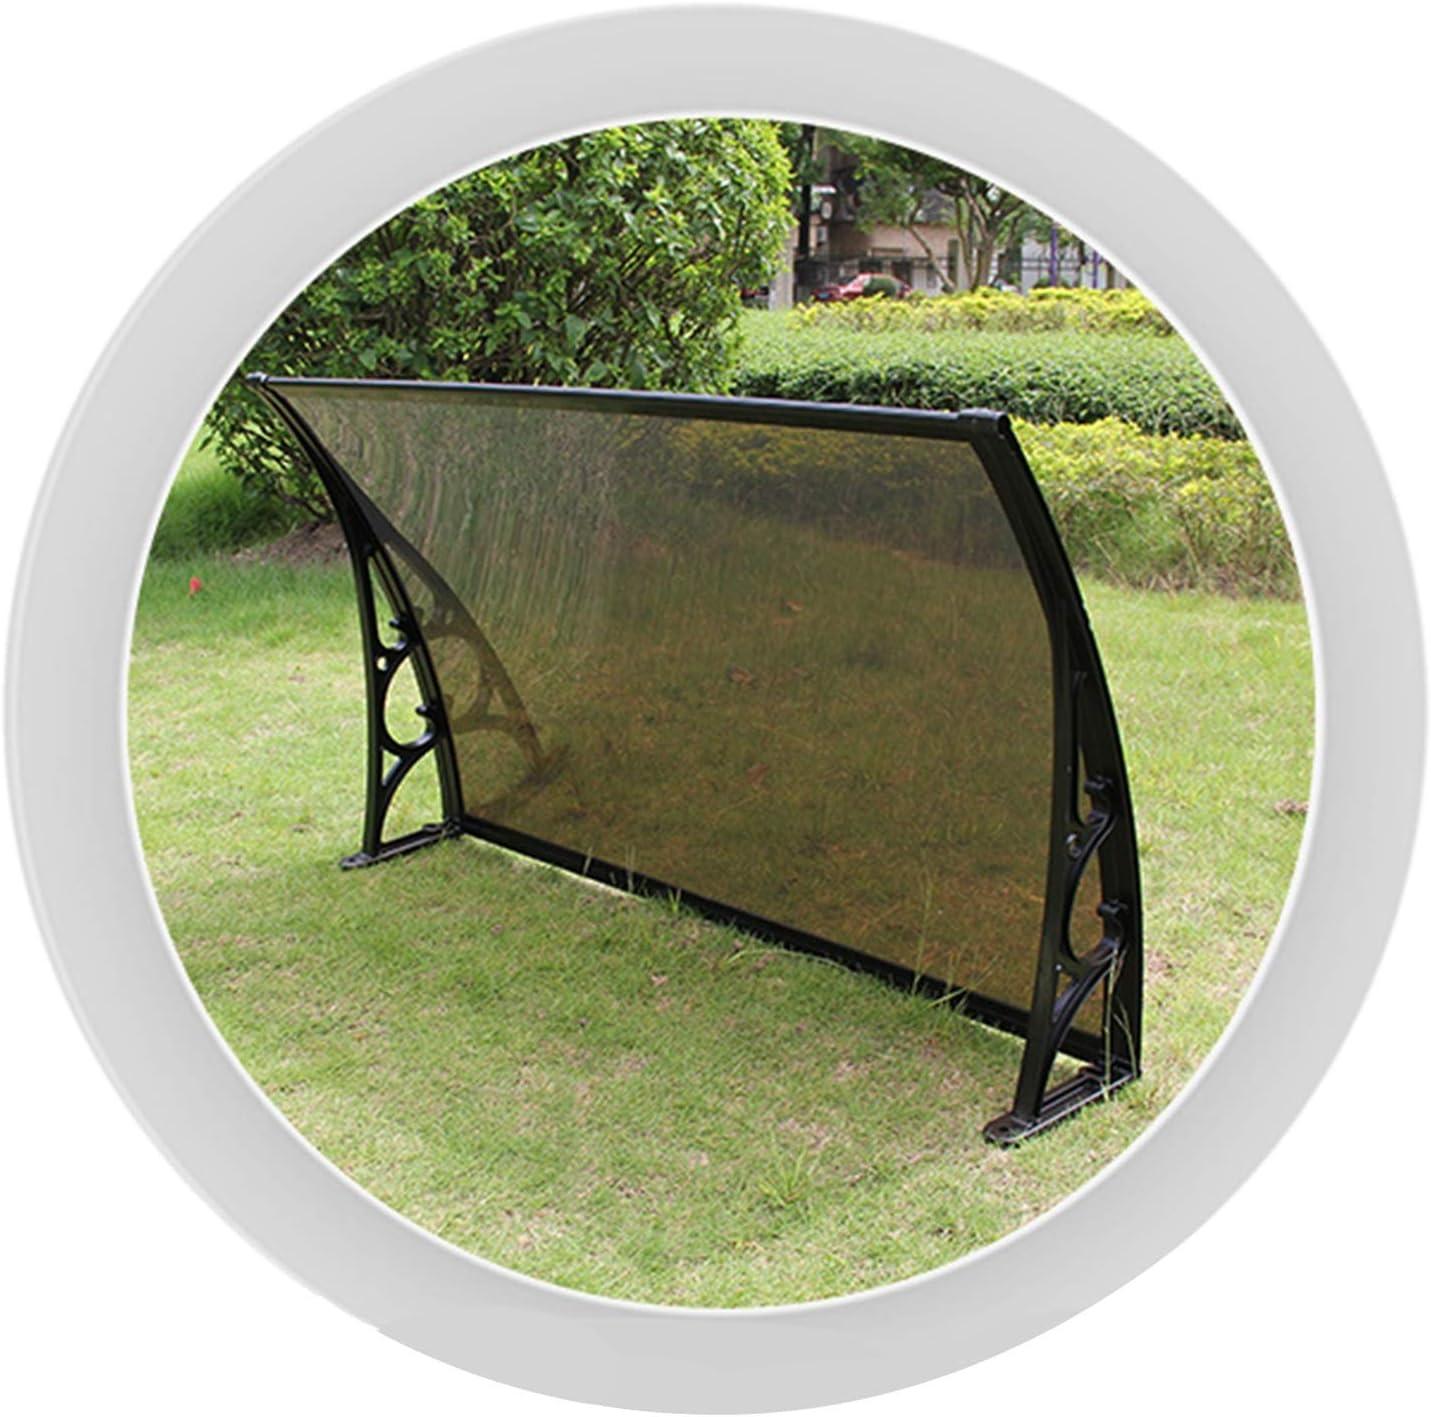 JIANFEI Roofing Canopies, Transparent Polycarbonate Door Canopy